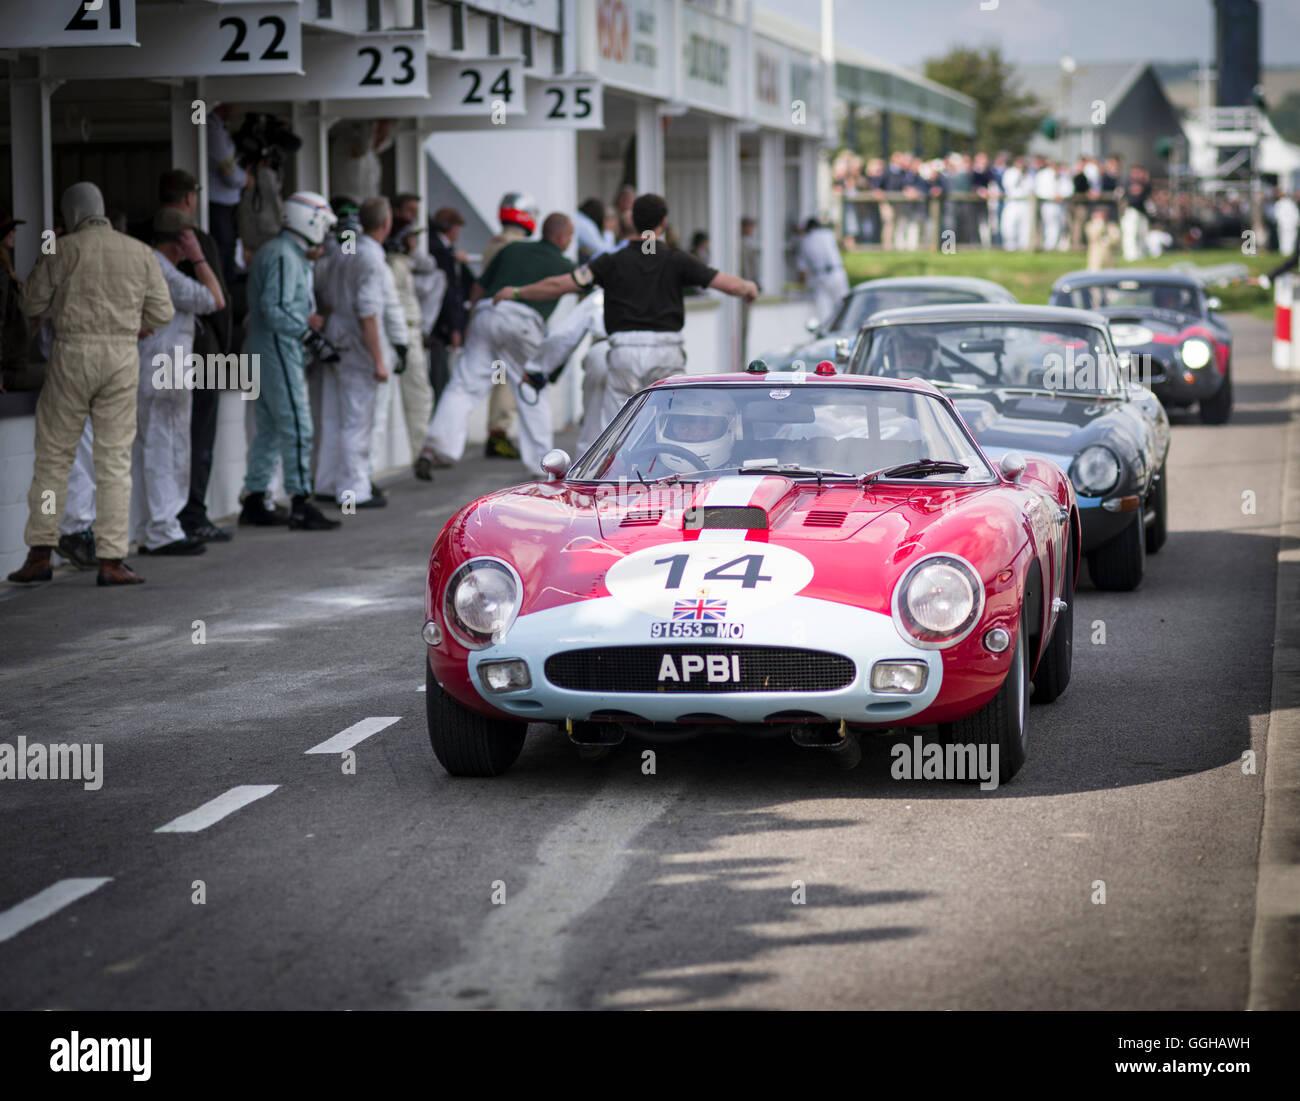 Ferrari Pit Stockfotos & Ferrari Pit Bilder - Alamy